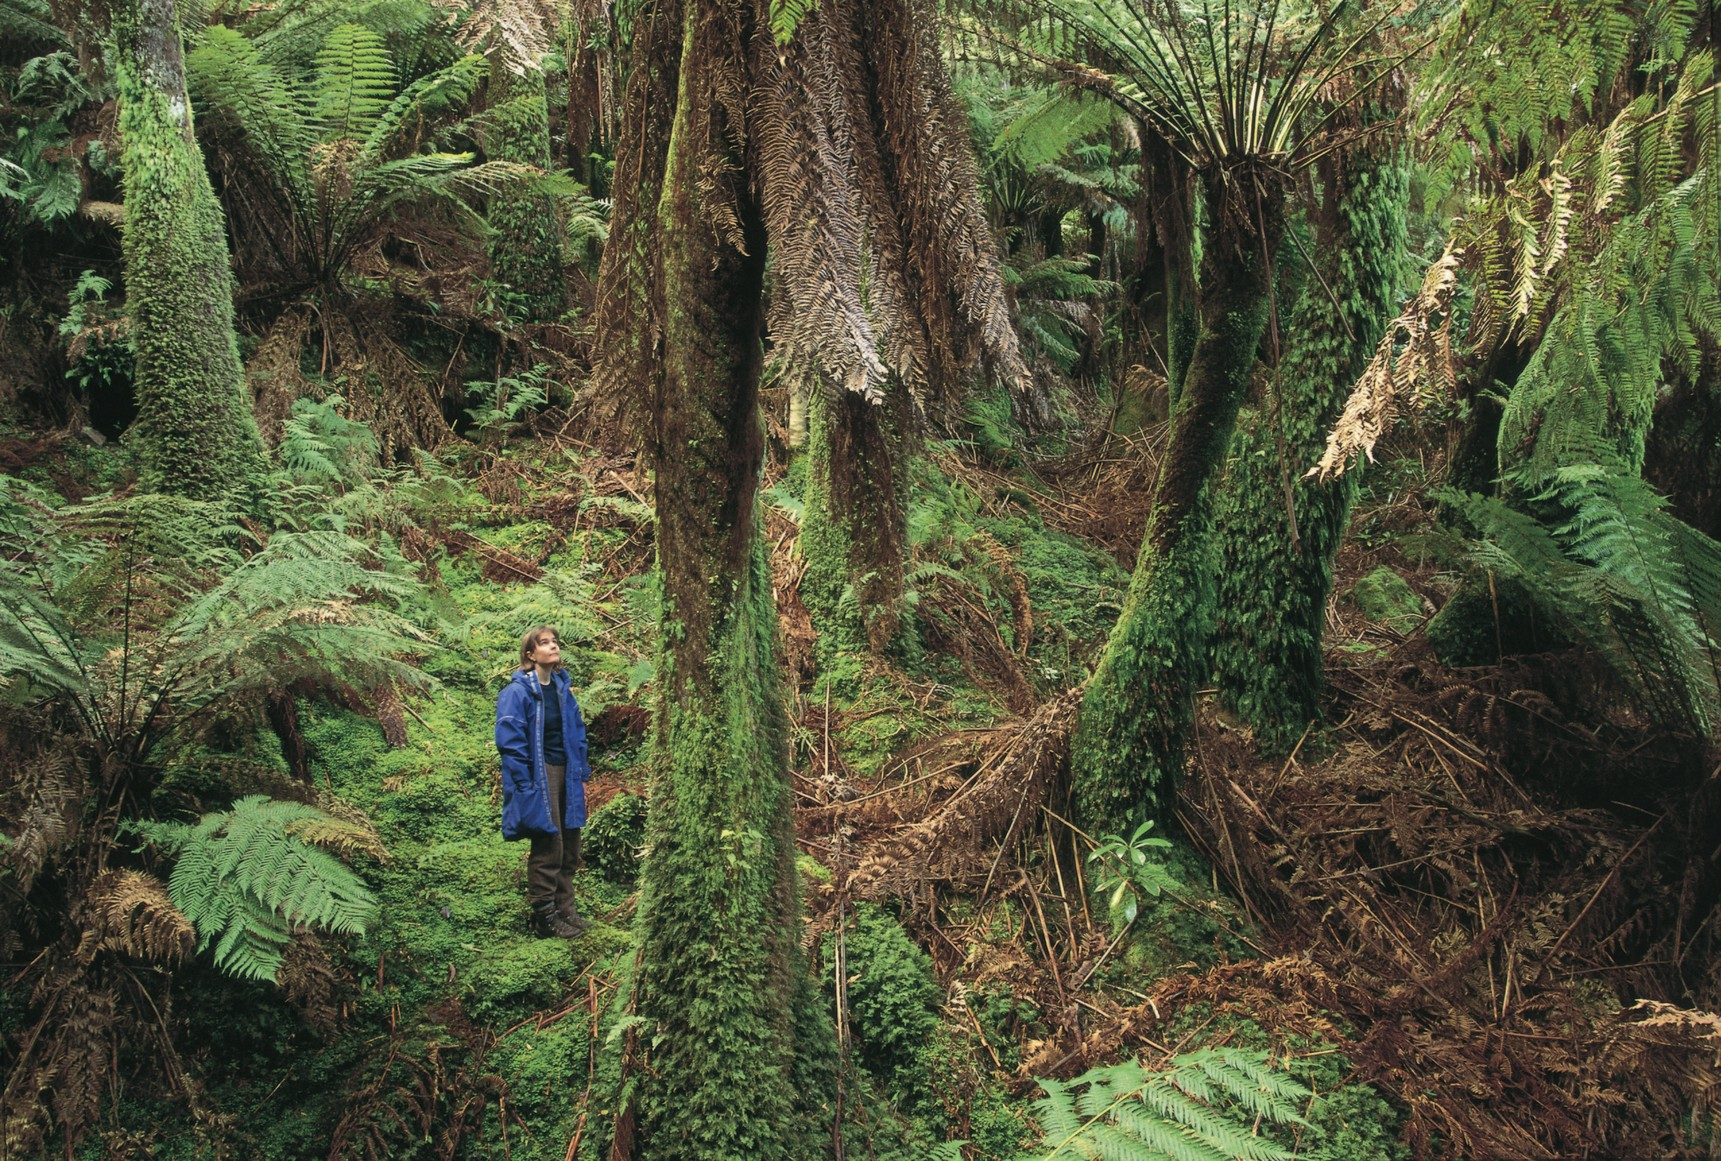 aboriginal plants uses coastal queensland pdf